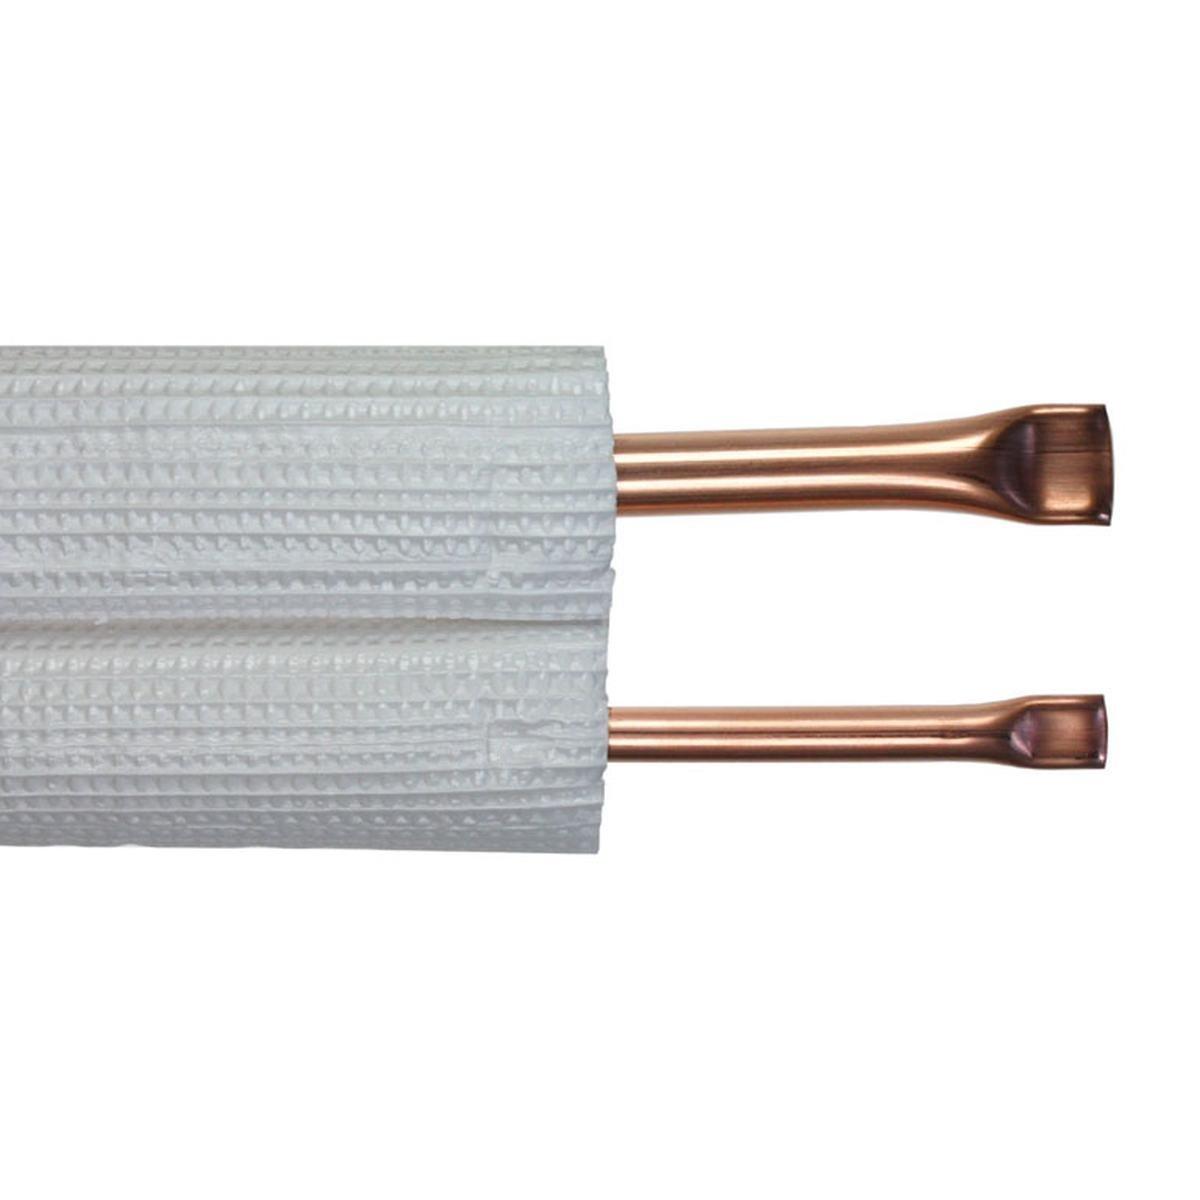 "Kopparrör isolerad dubbel 1/4""+3/8"" x 1,0 mm. 20 m"